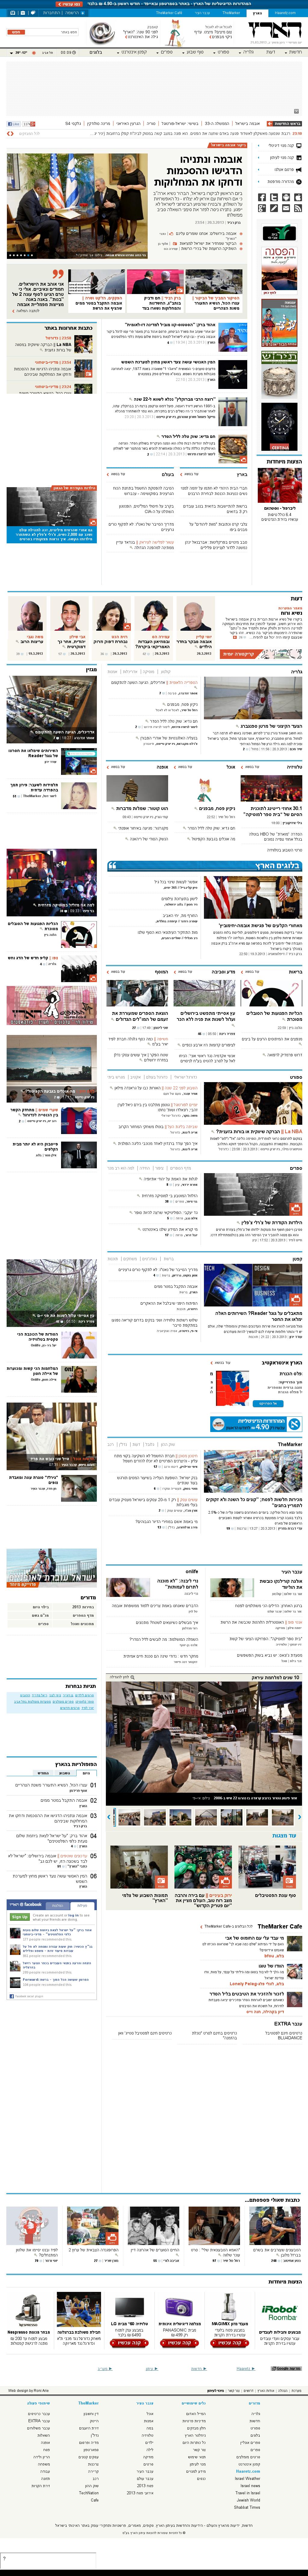 Haaretz at Wednesday March 20, 2013, 10:09 p.m. UTC